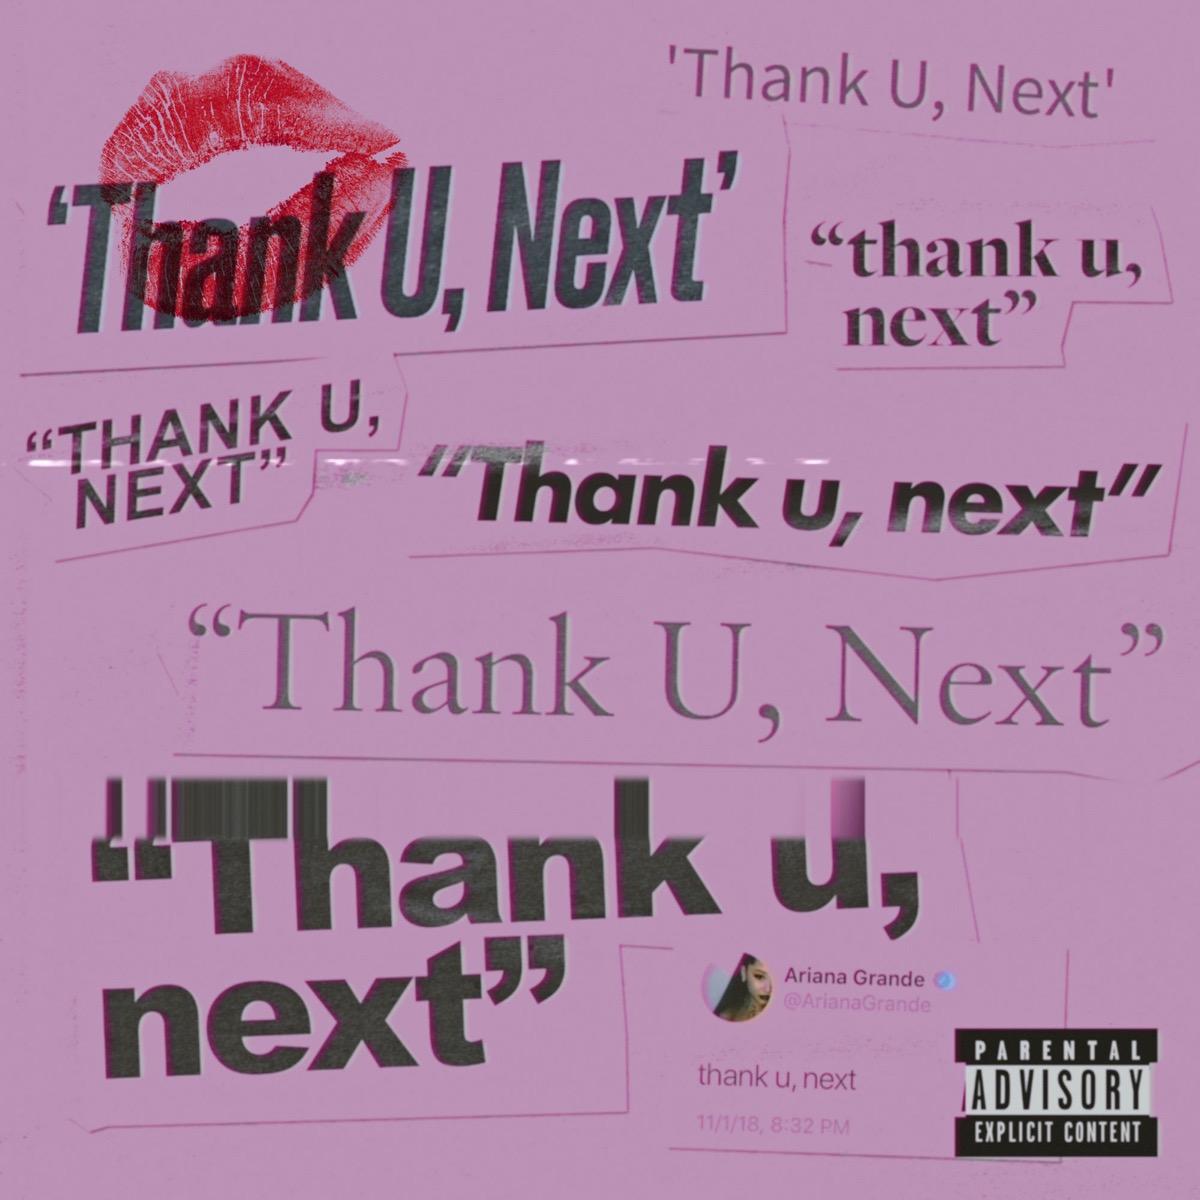 ariana grande thank u next single cover